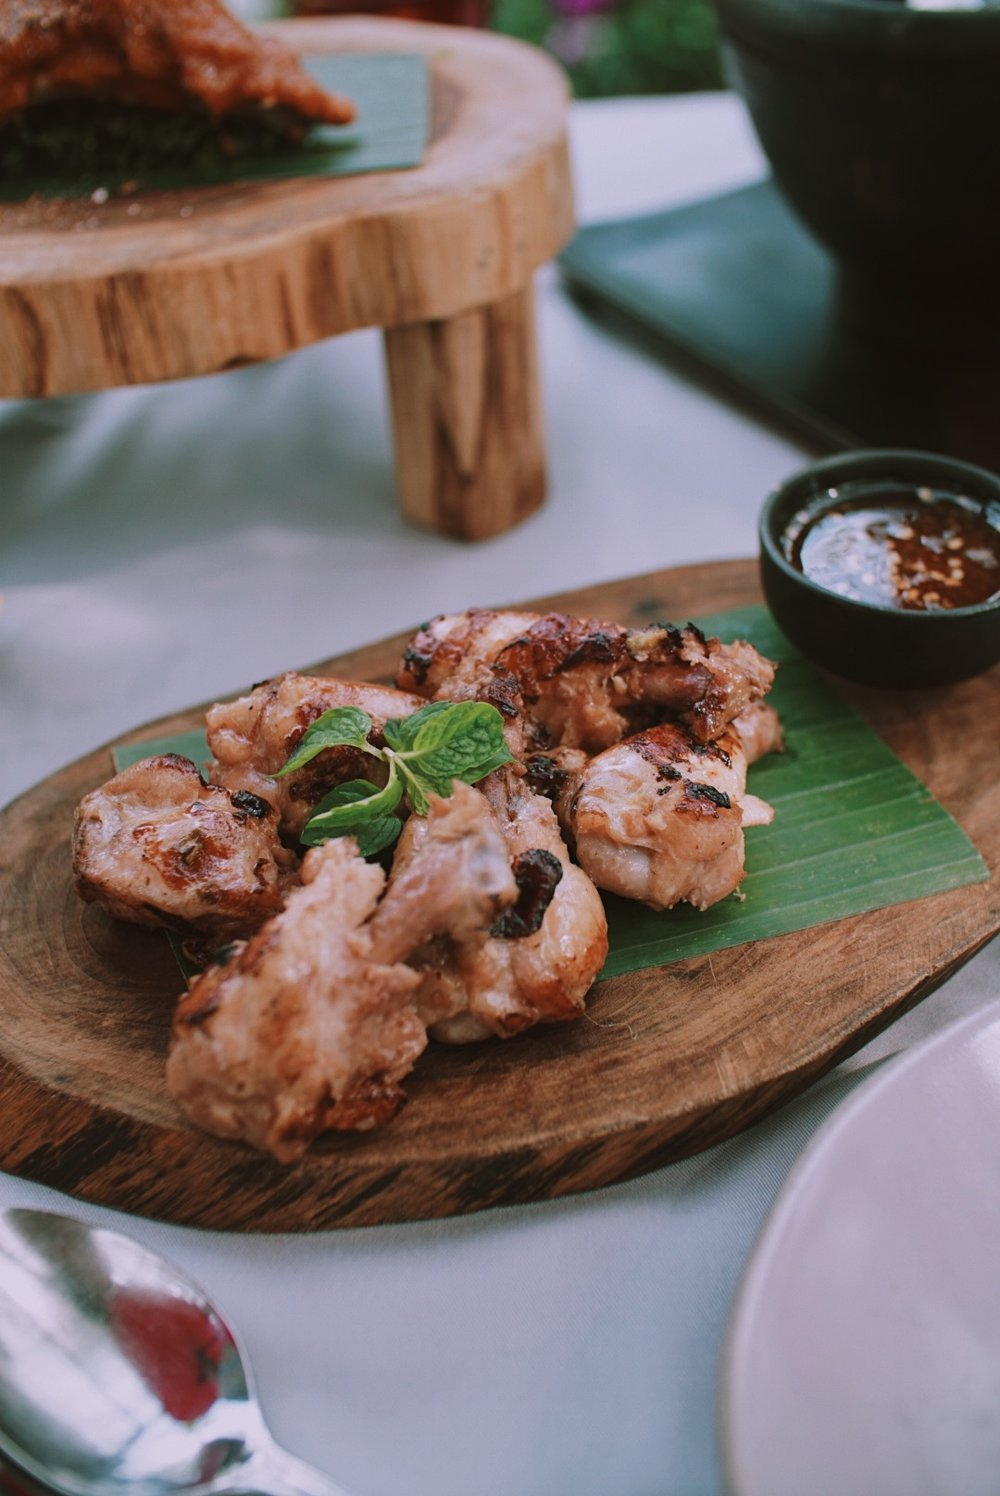 Menu makan siang kami di hari pertama, di restoran Manda de Laos dekat hotel: ayam goreng yang dibumbui rempah manis dan sambal ala Laos (agak asam manis gitu). Enakk!